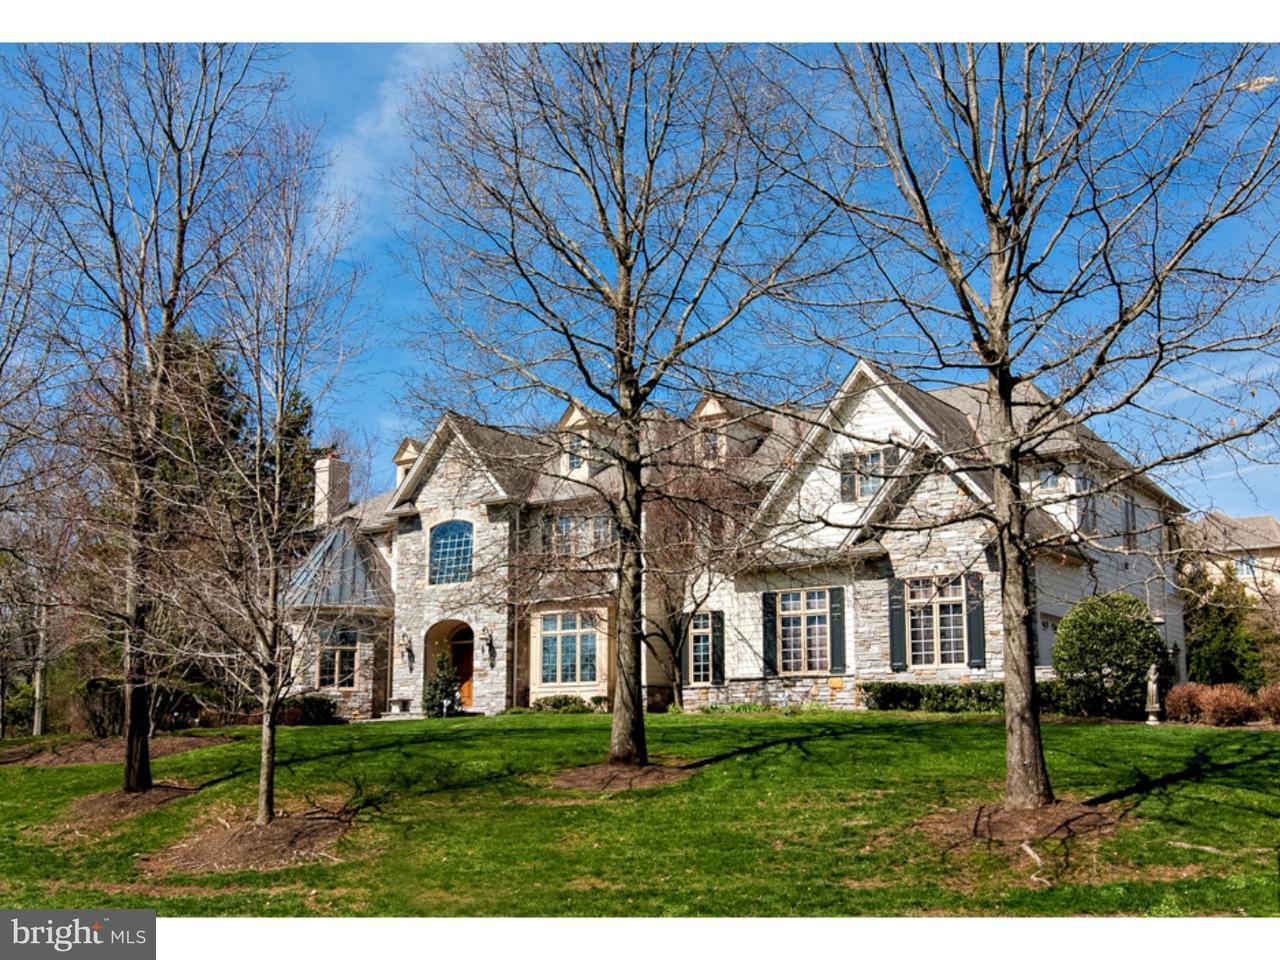 Single Family Home for Sale at 801 S PENN OAK Road Ambler, Pennsylvania 19002 United States